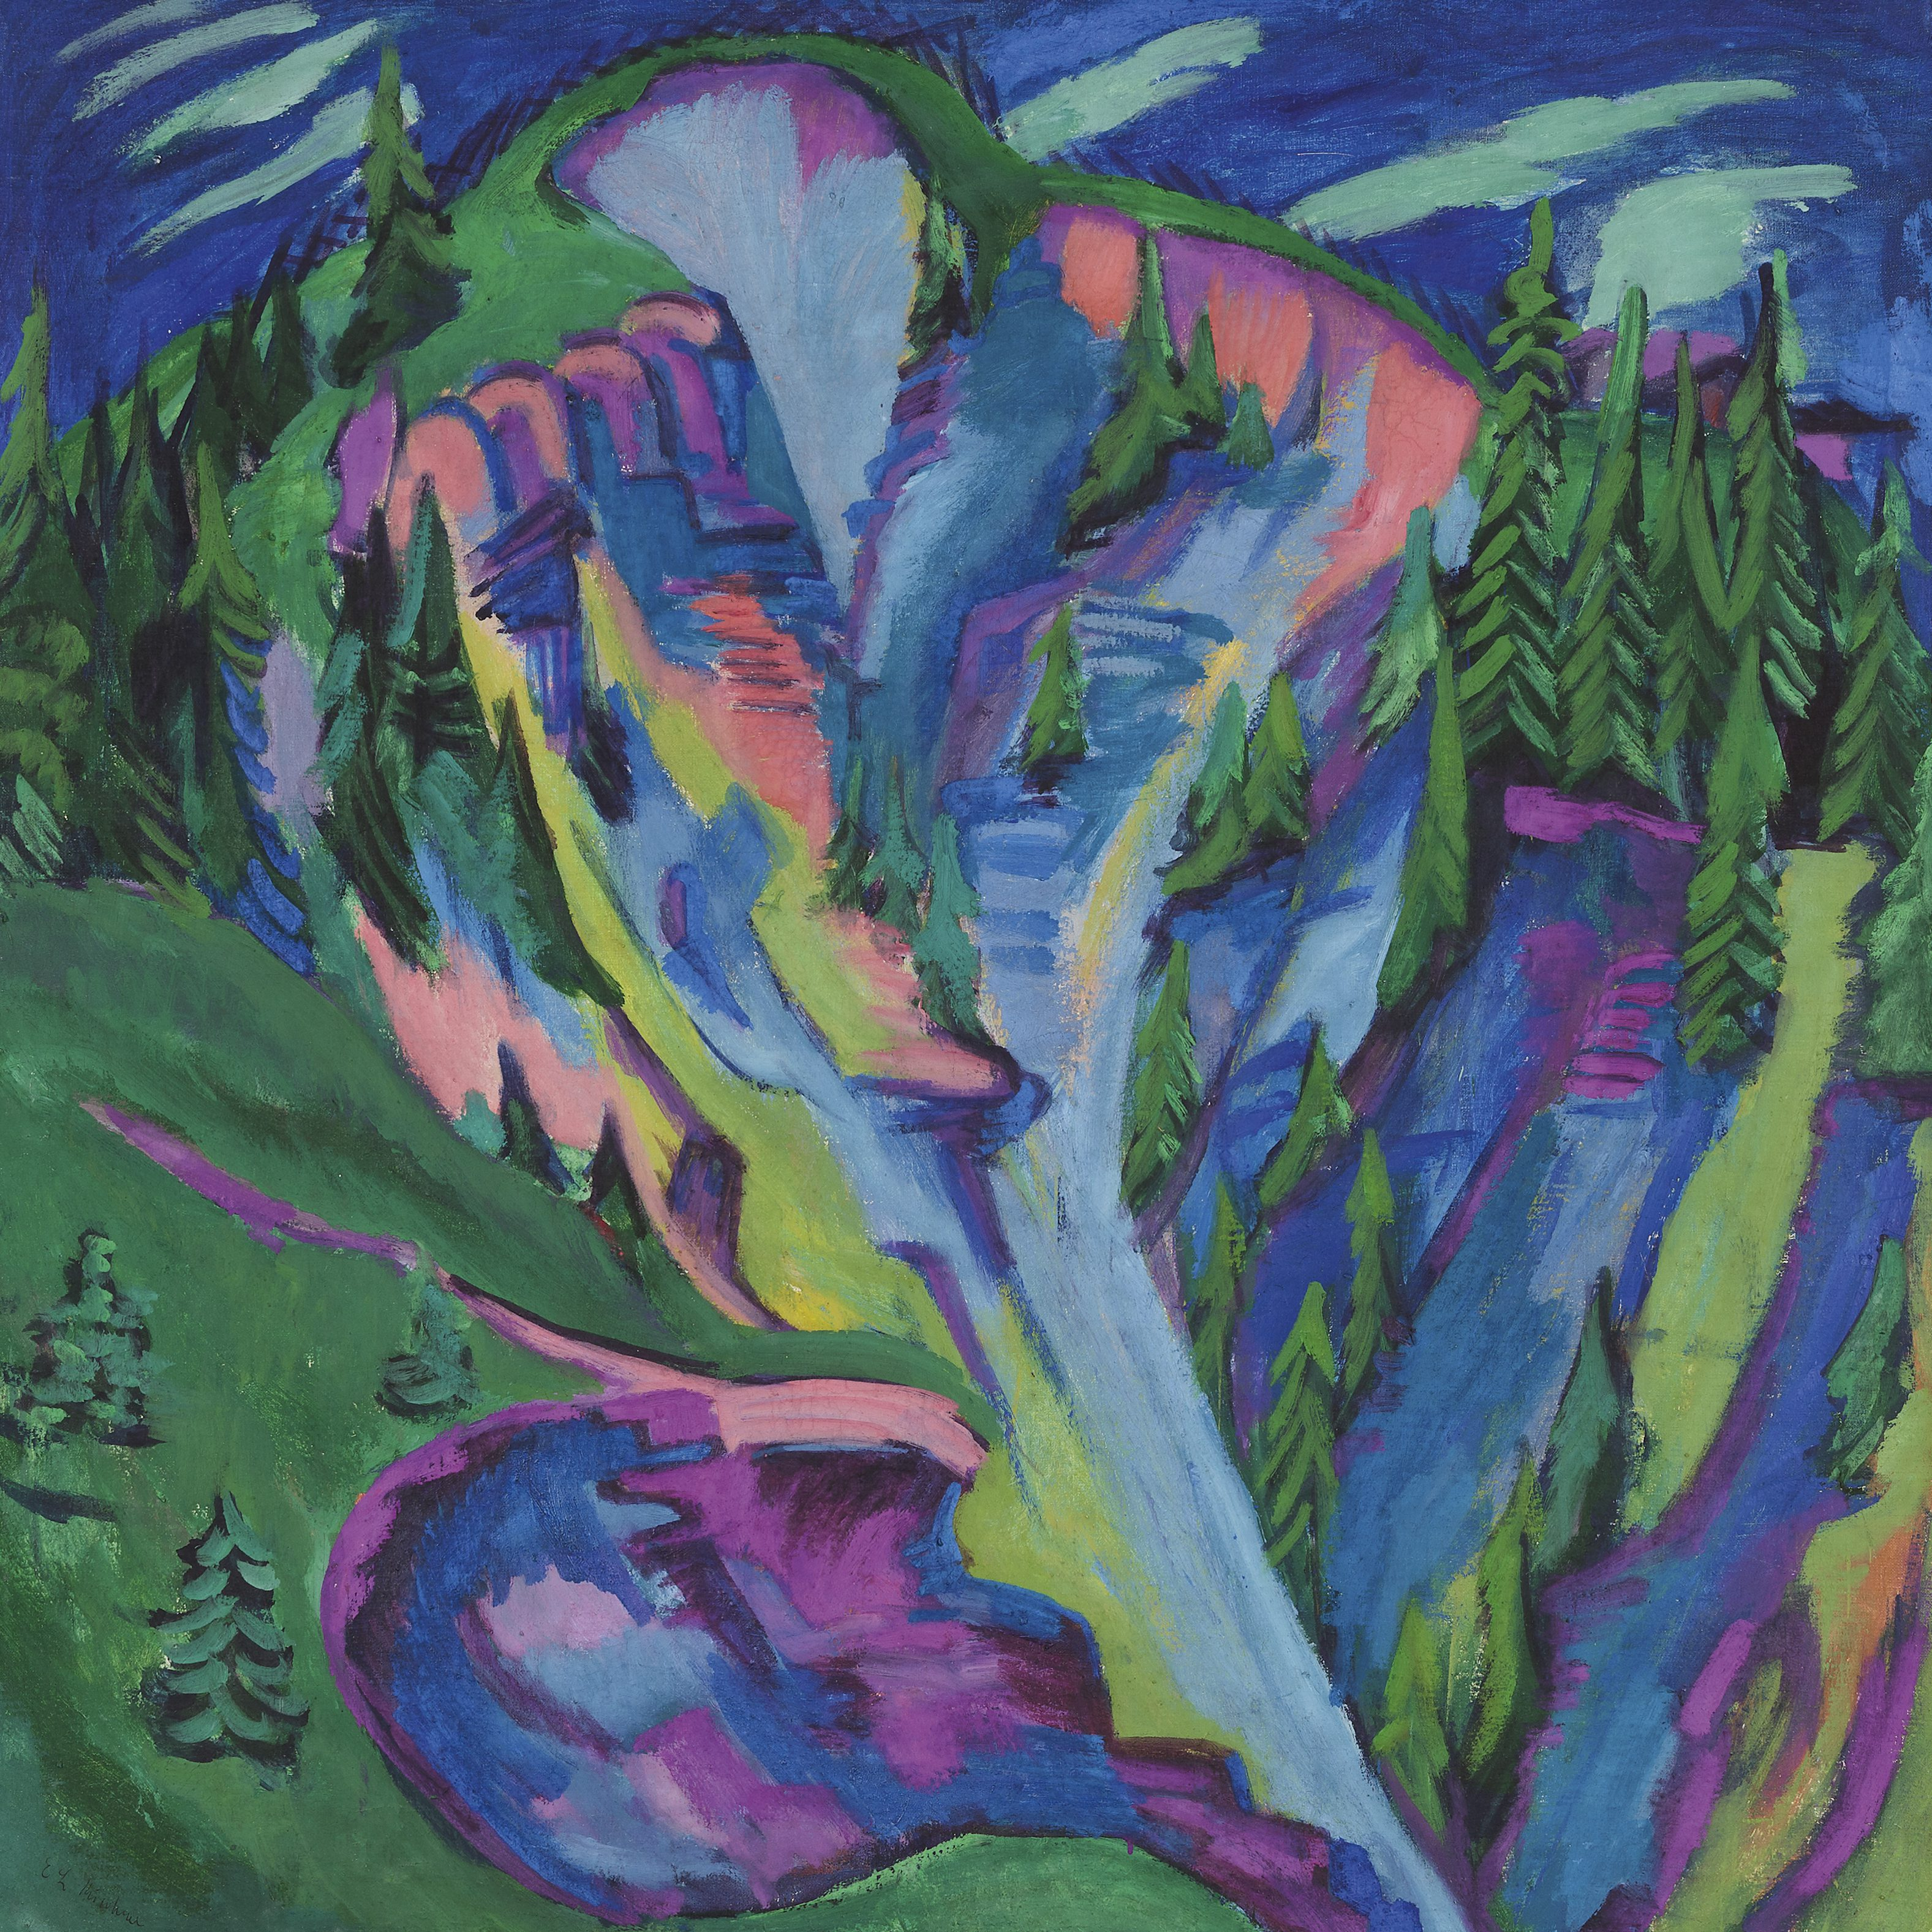 Ernst Ludwig Kirchner - Das Tobel, 1920